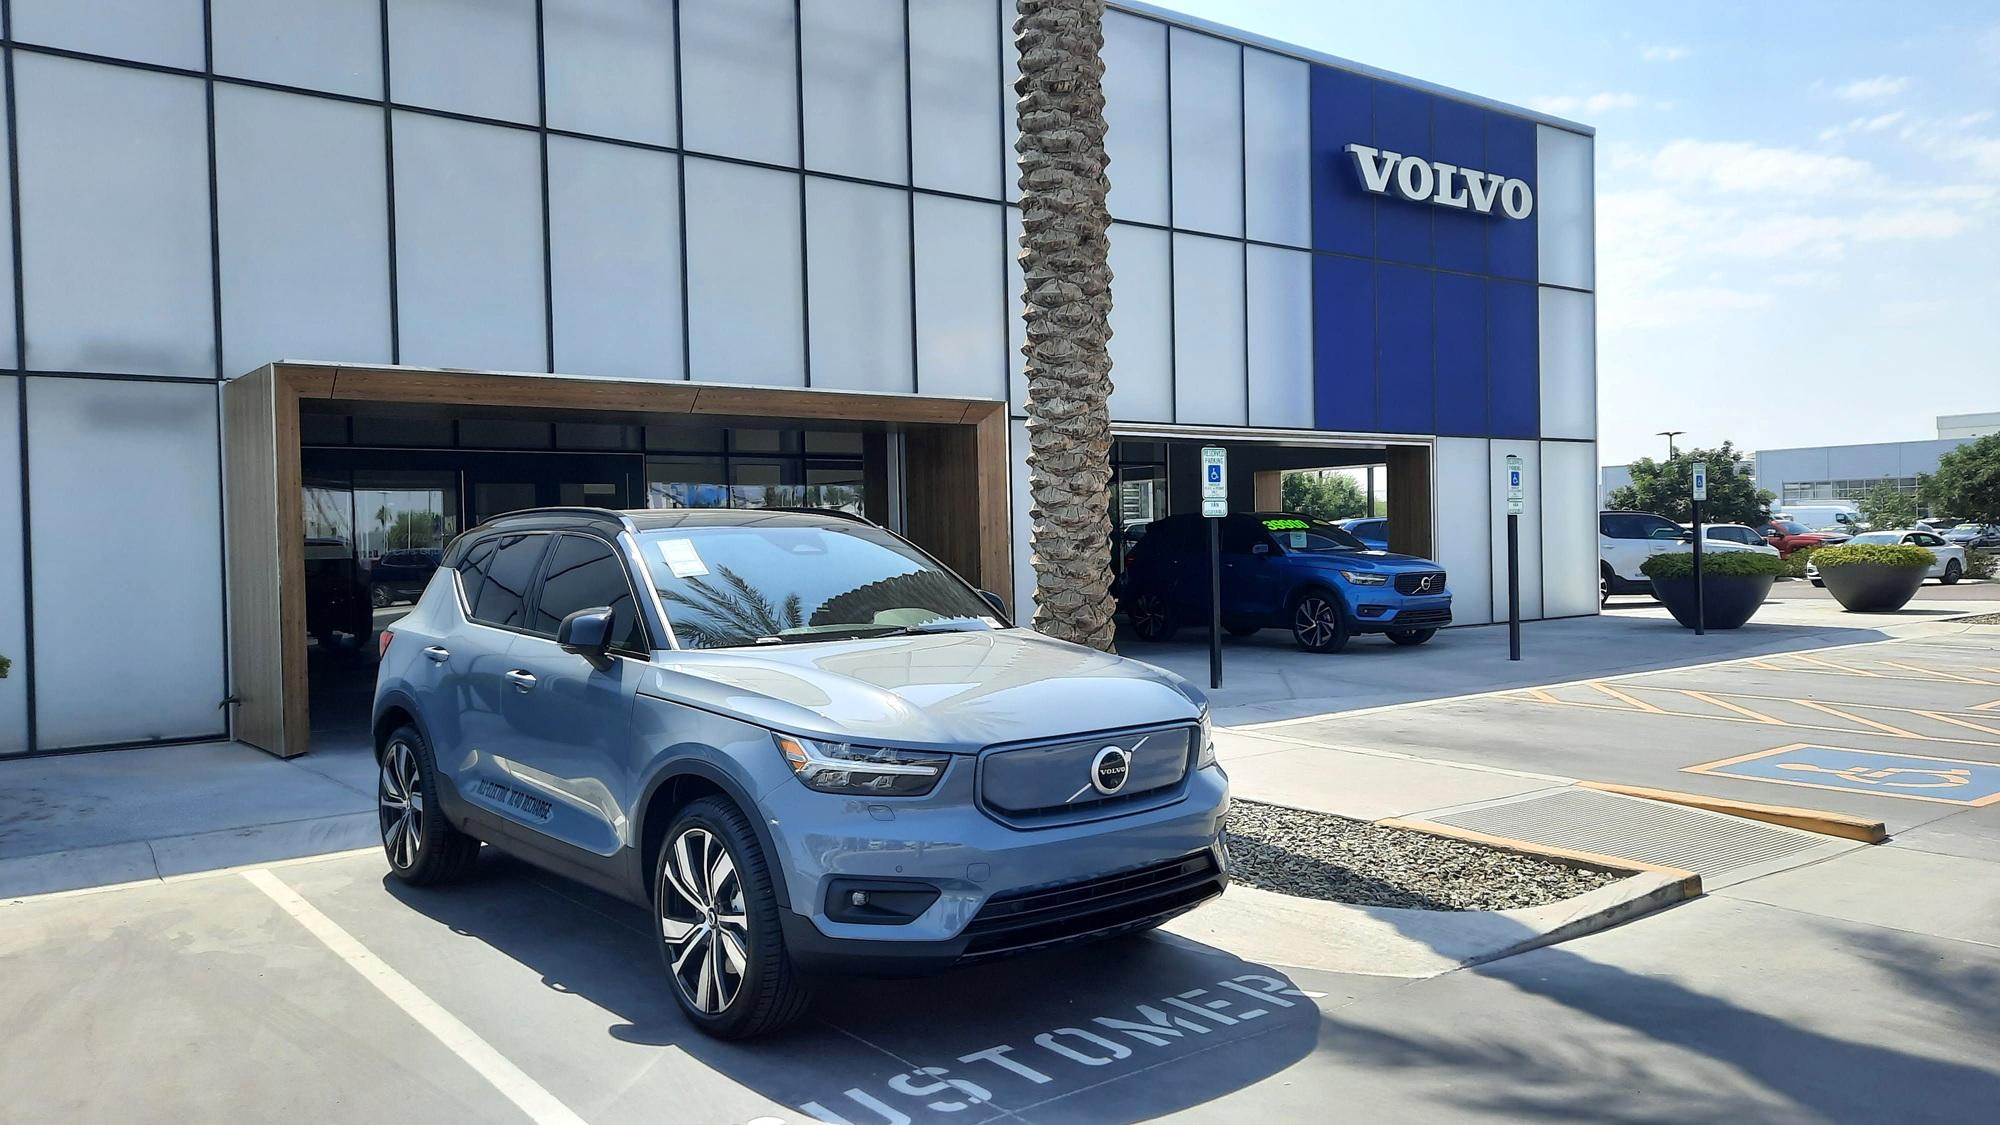 Volvo XC40 Recharge  -  Volvo Cars Gilbert, Gilbert AZ  [photo from Chargeway]